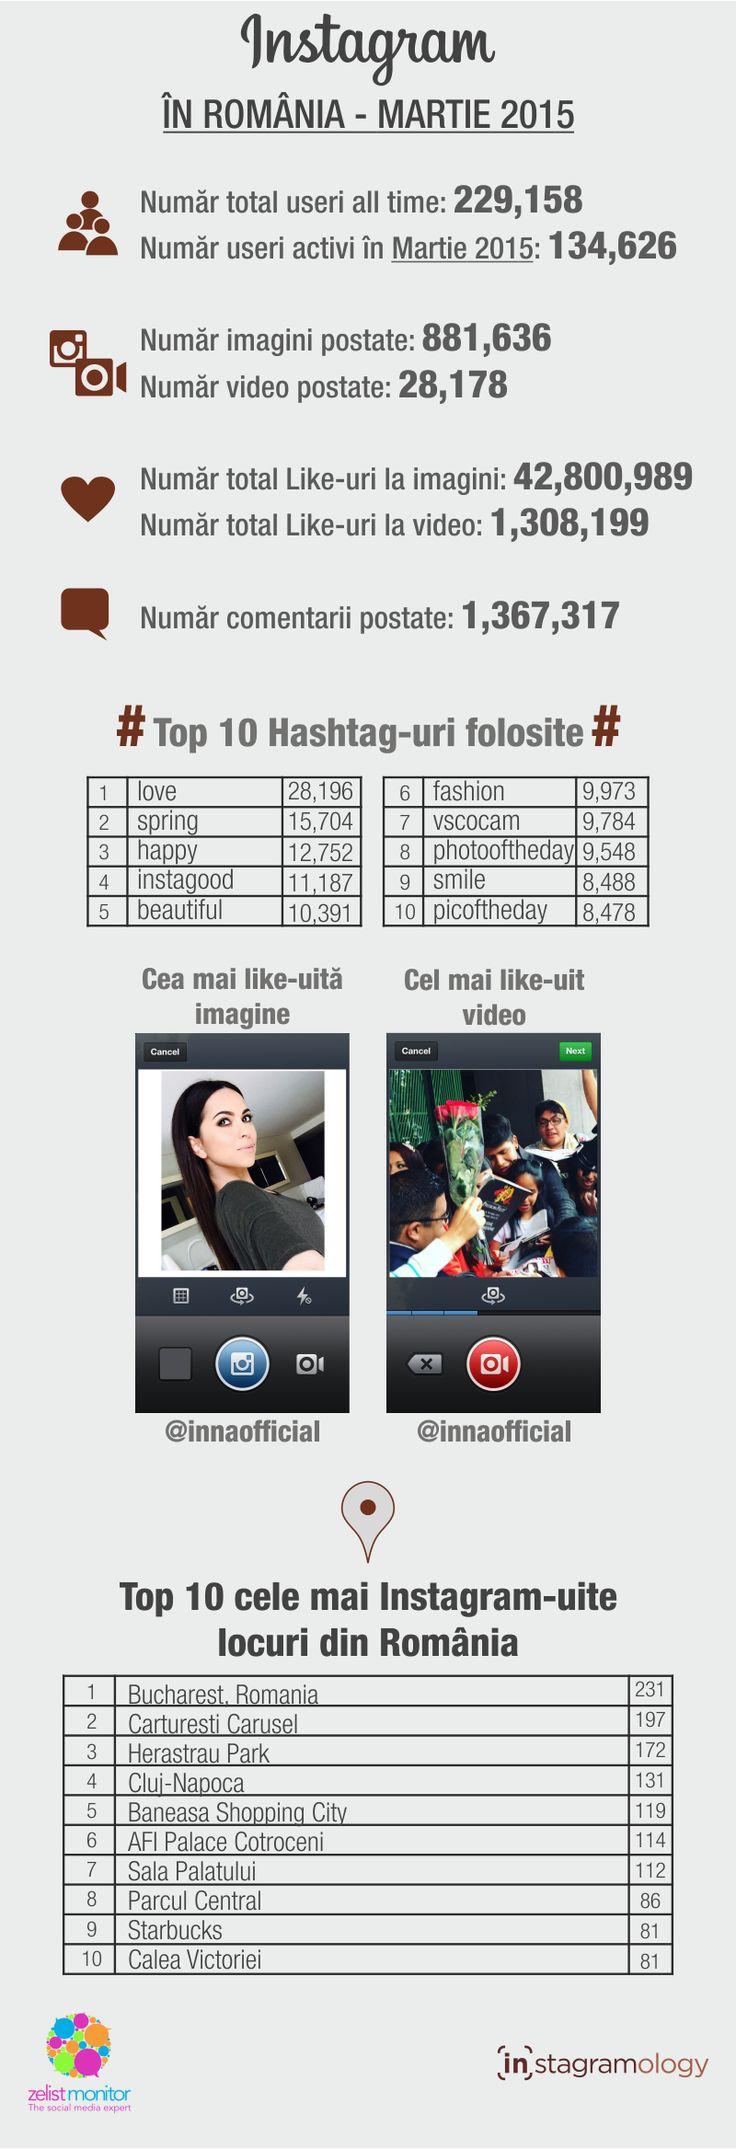 Statistici Instagram in Romania – Martie 2015